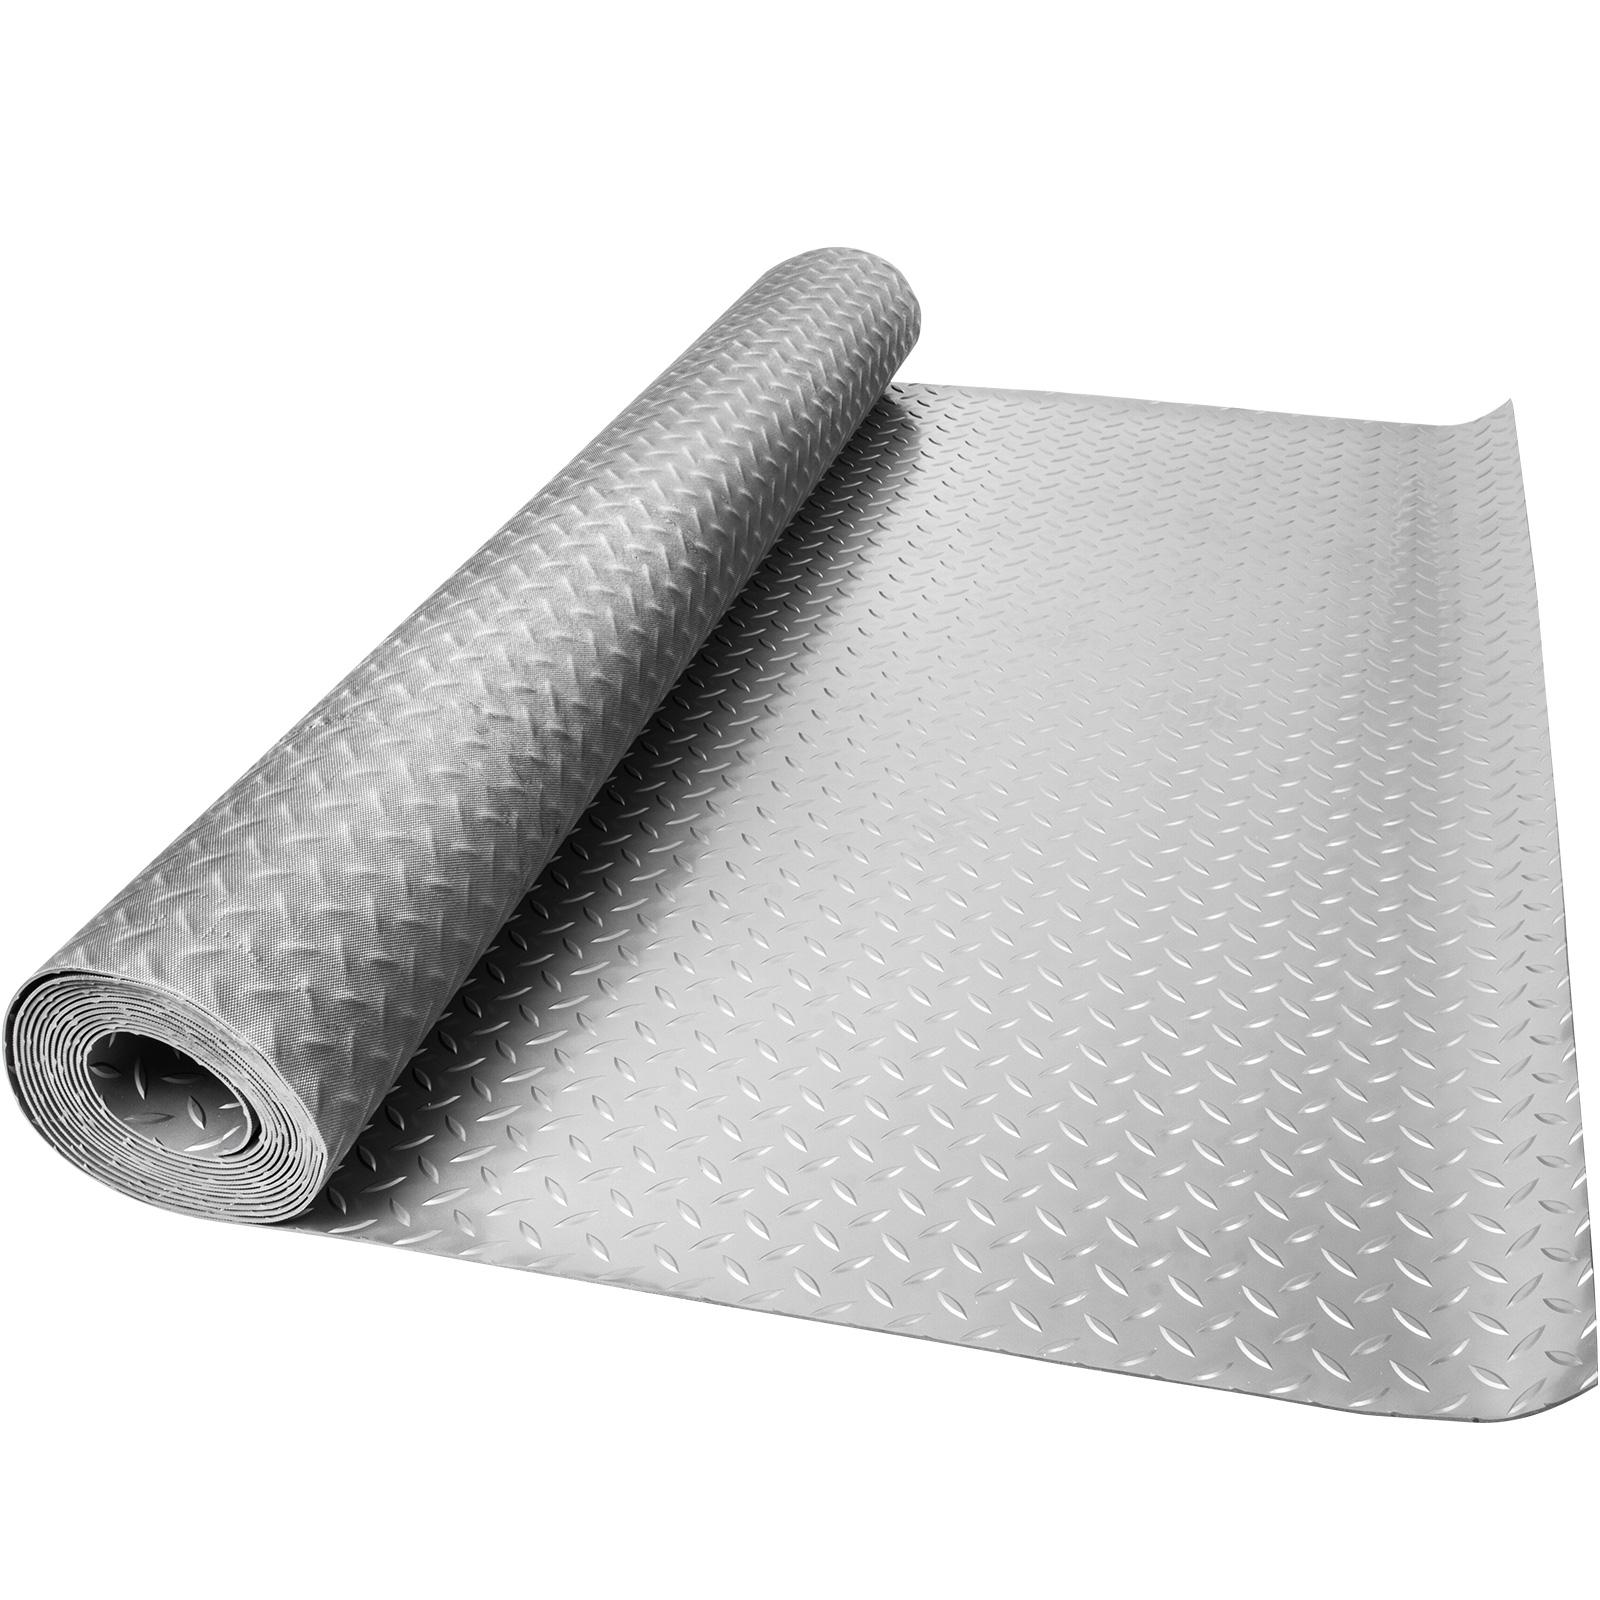 thumbnail 59 - Garage Flooring Mat Roll Car Trailer Floor Covering 1.1m Width Gym Floor Roll